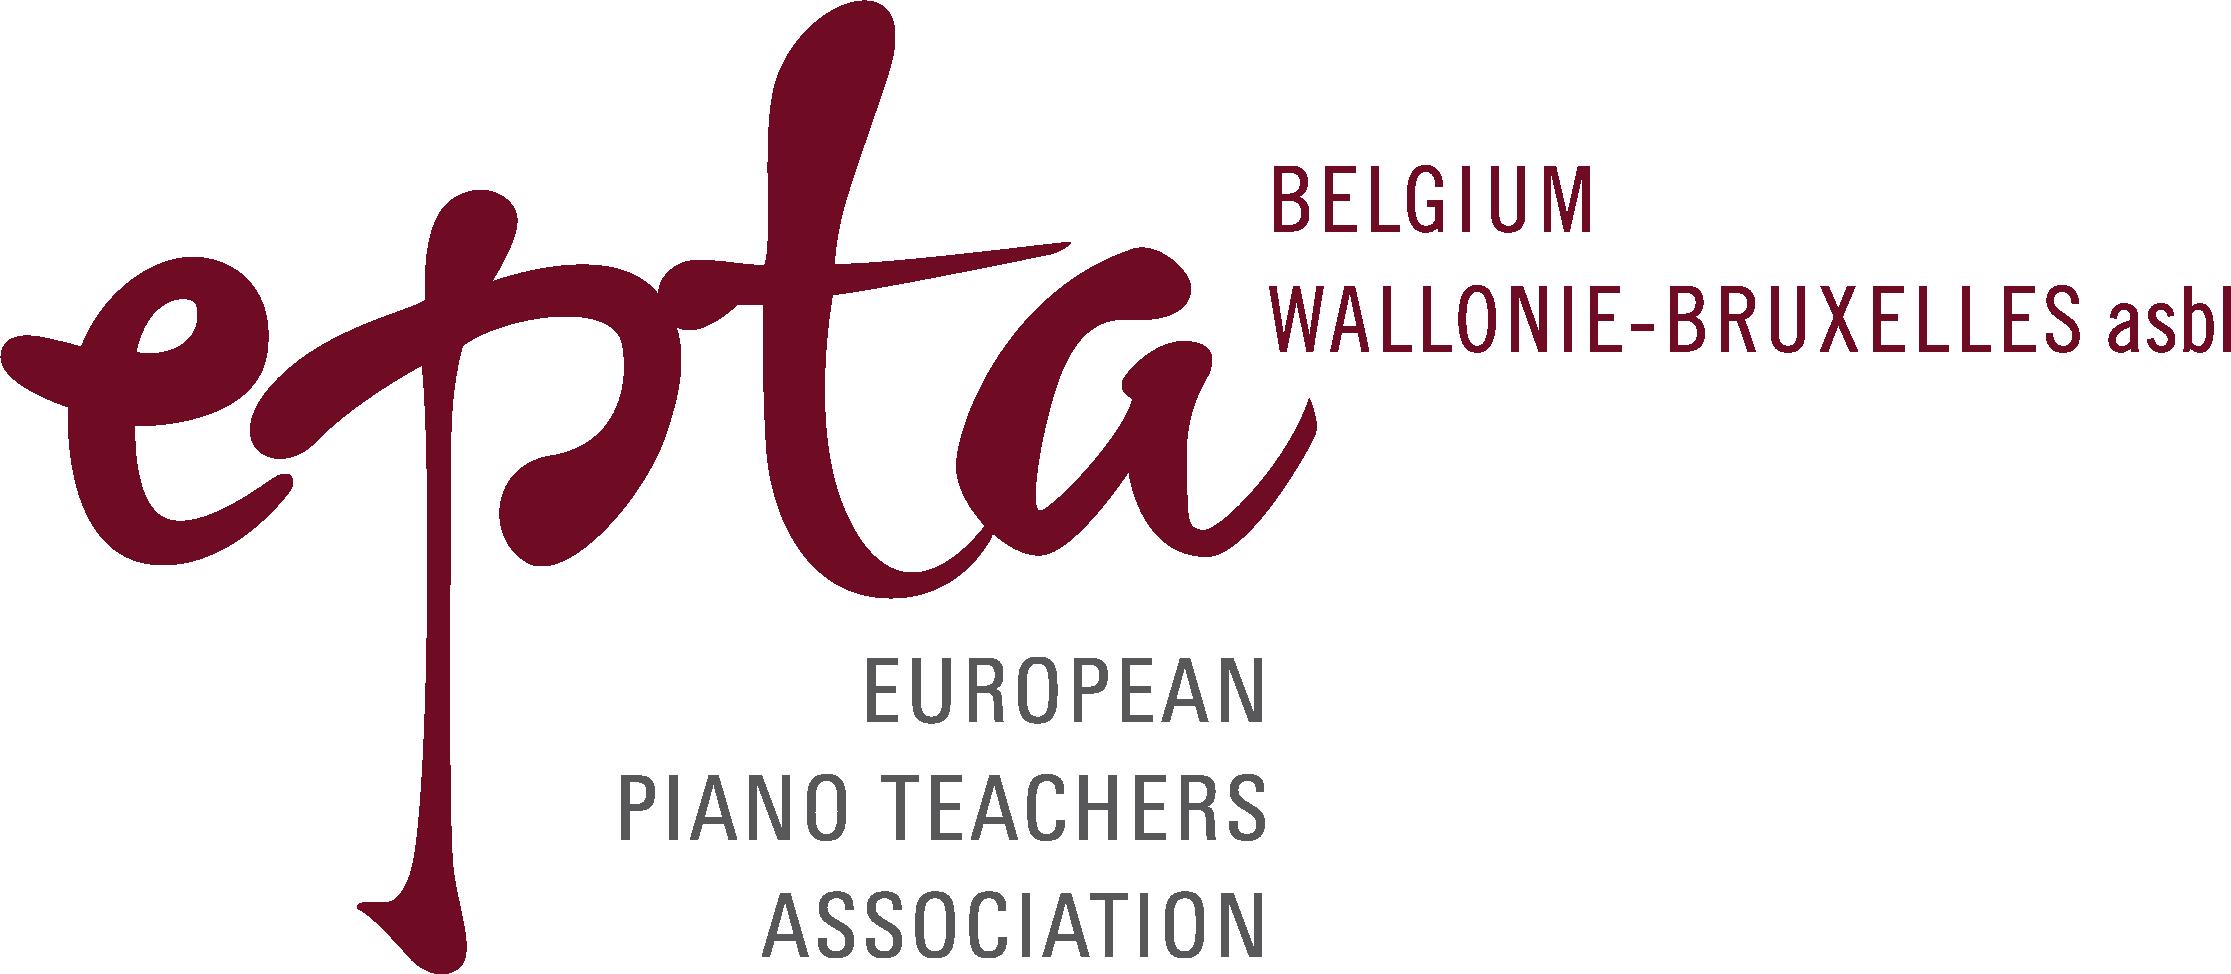 EPTA-Belgium W-B